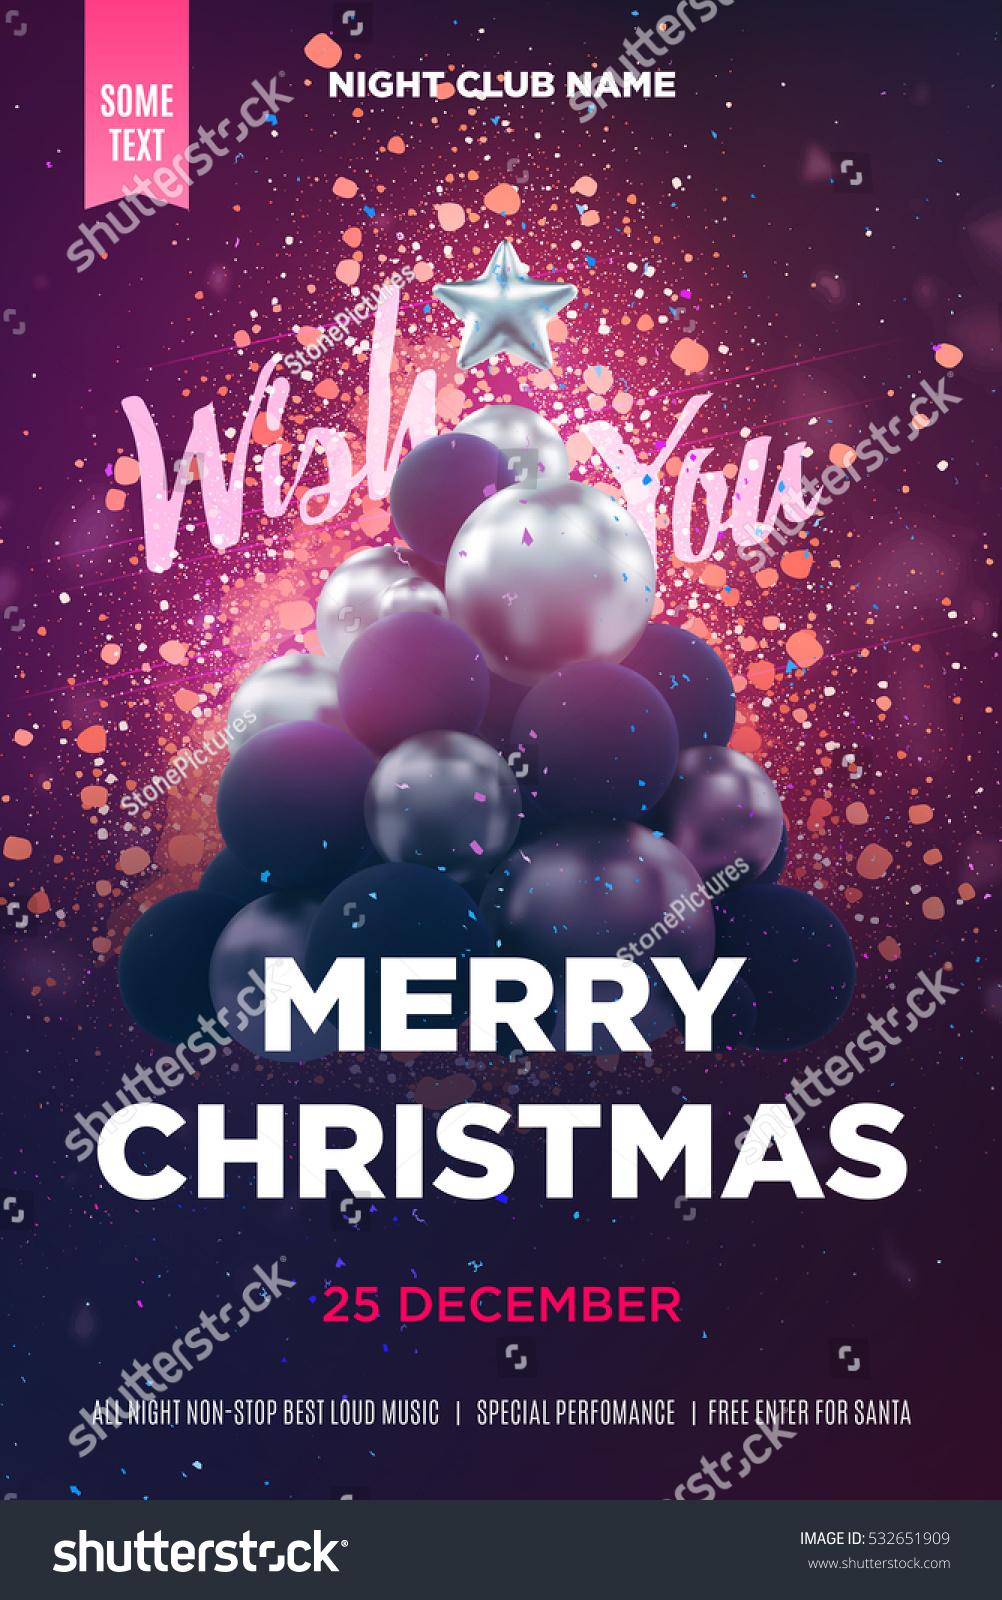 Christmas Poster Flyer Template Silver Christmas Stock Image